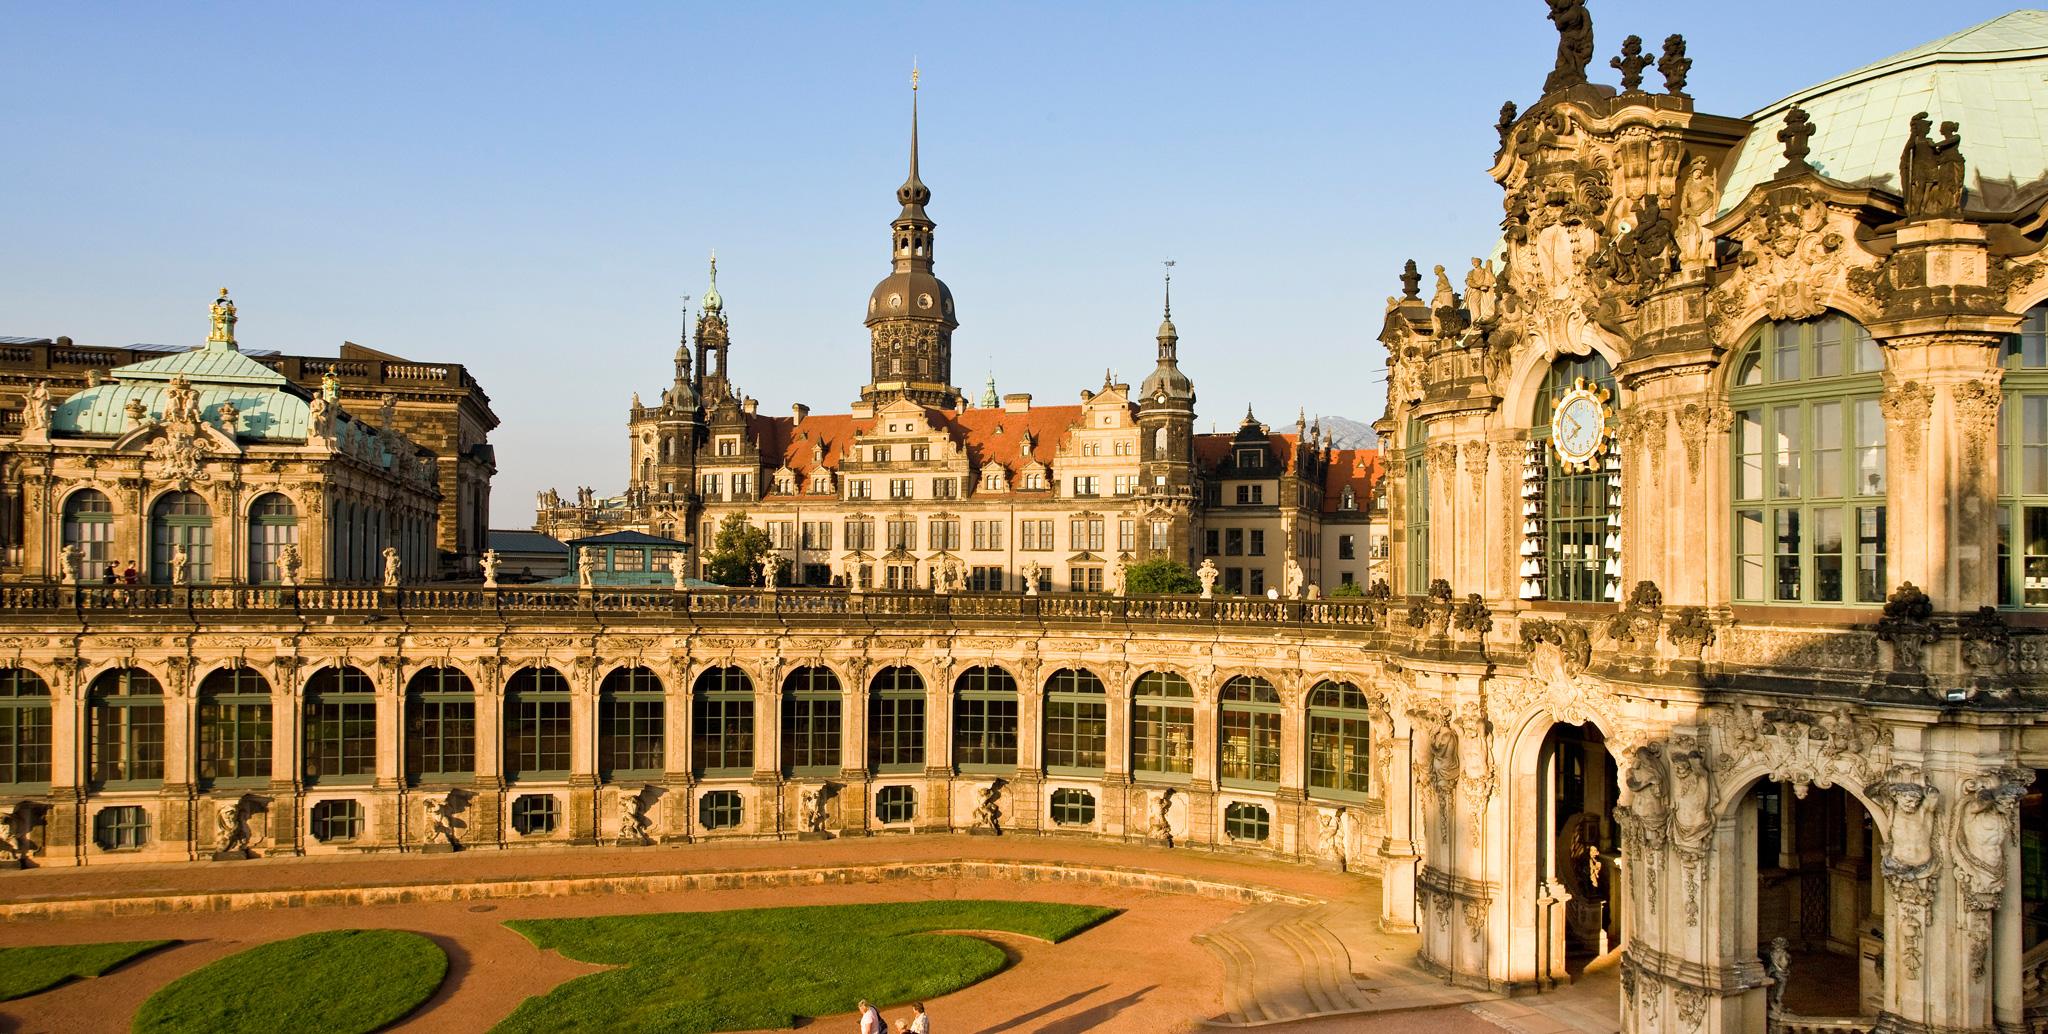 Alemania: Becas Para Cursos Cortos en Varios Temas Fundación Baden-Württemberg